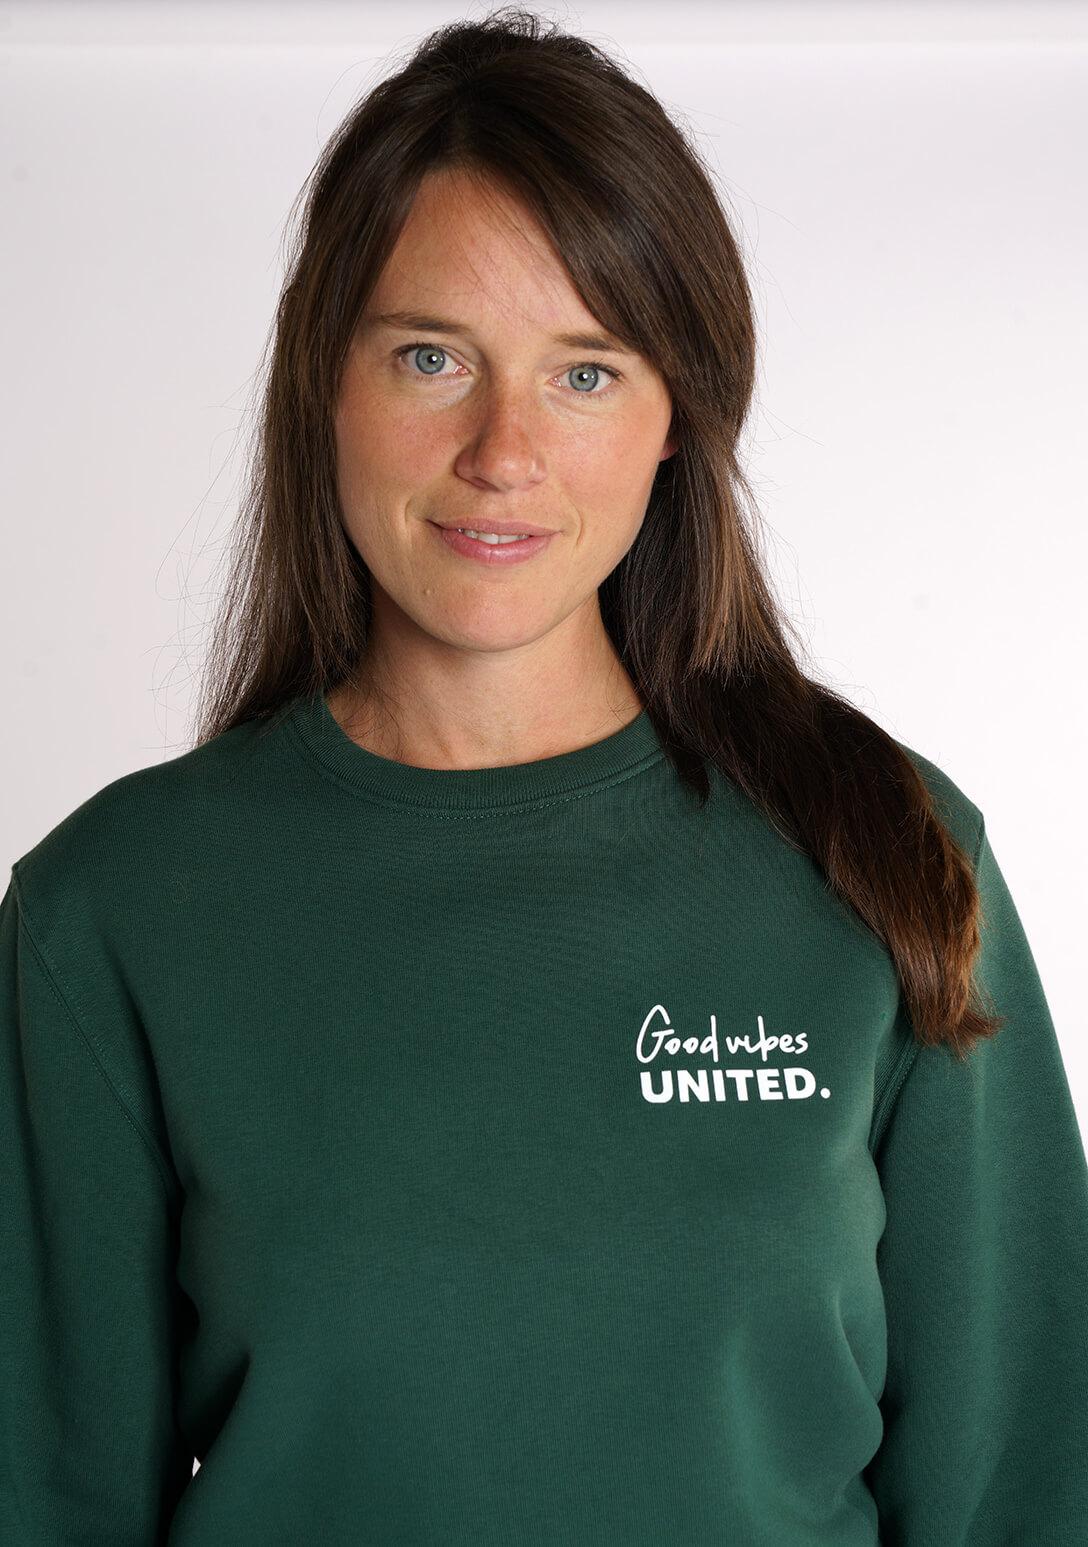 Good Vibes united twinning sweater van Mangos on Monday